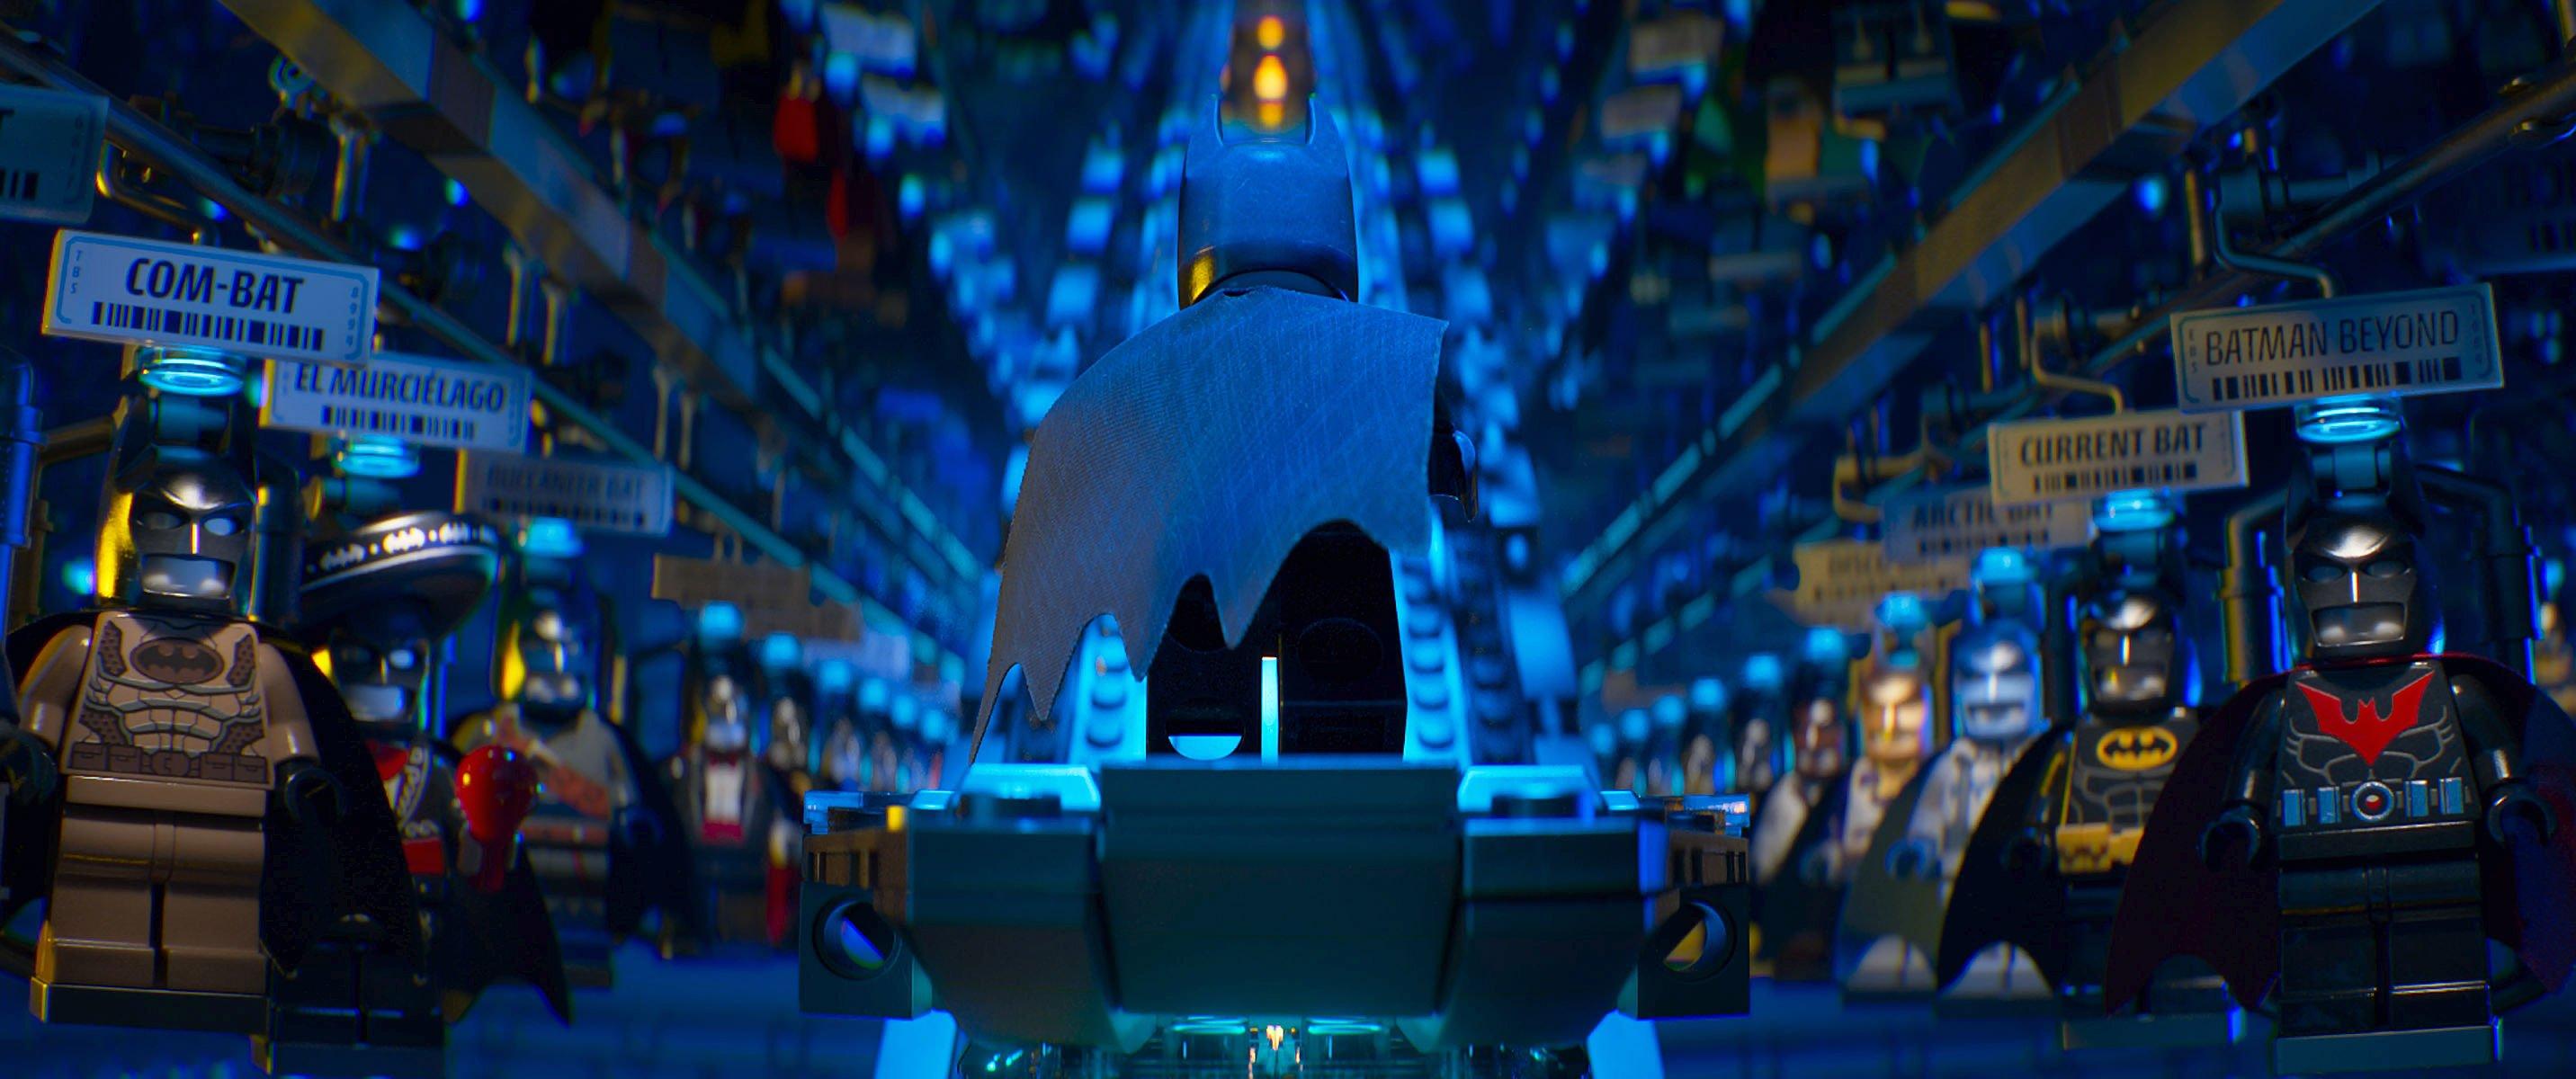 The Lego Batman Movie Wallpaper: 3840x2160 The Lego Batman Movie HD 4k HD 4k Wallpapers